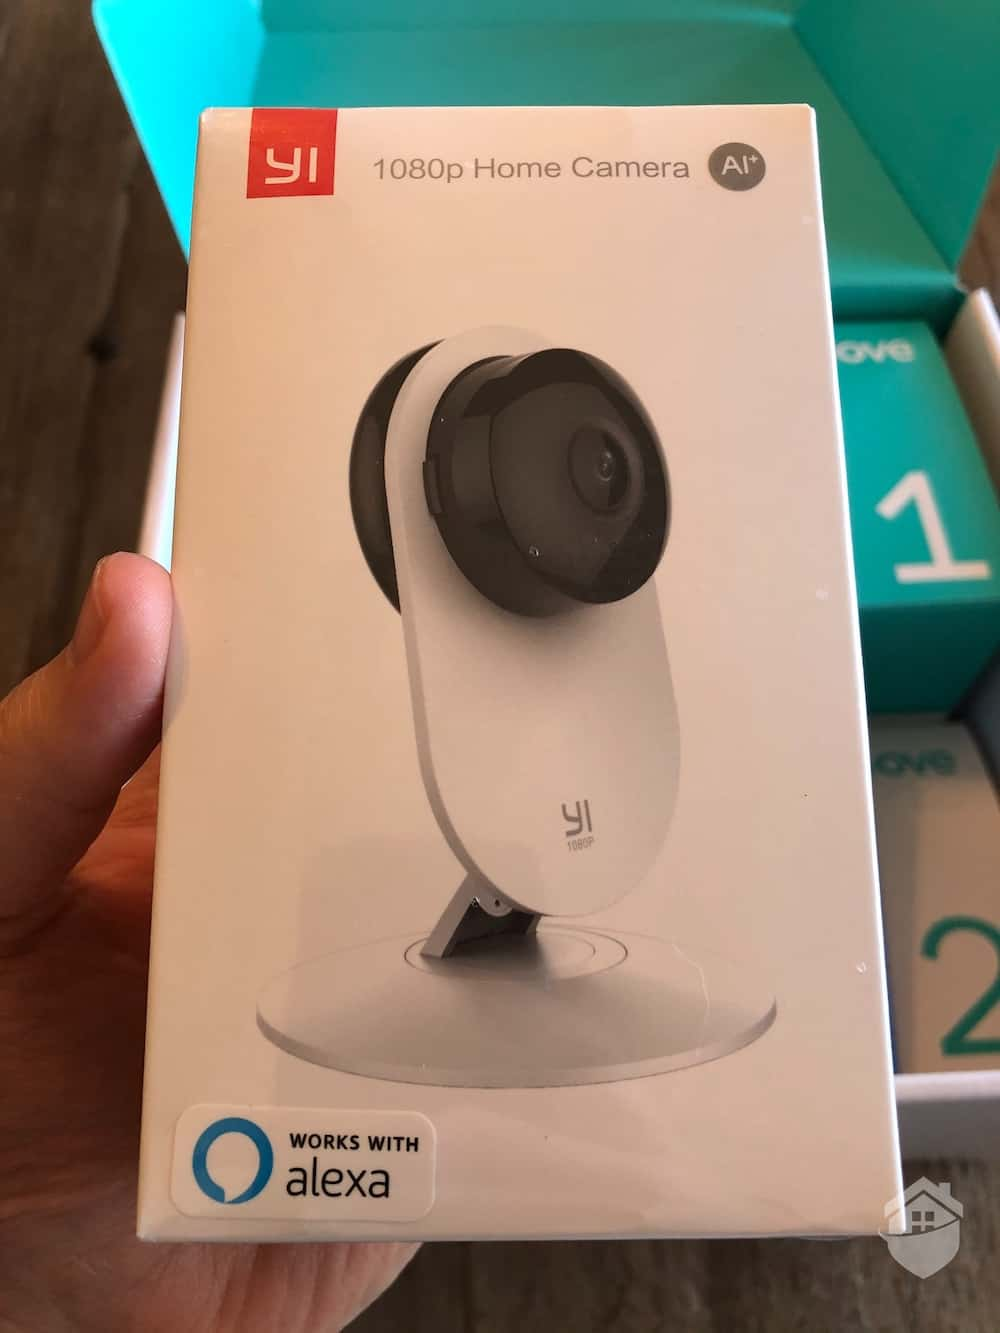 Cove 1080p Home Camera